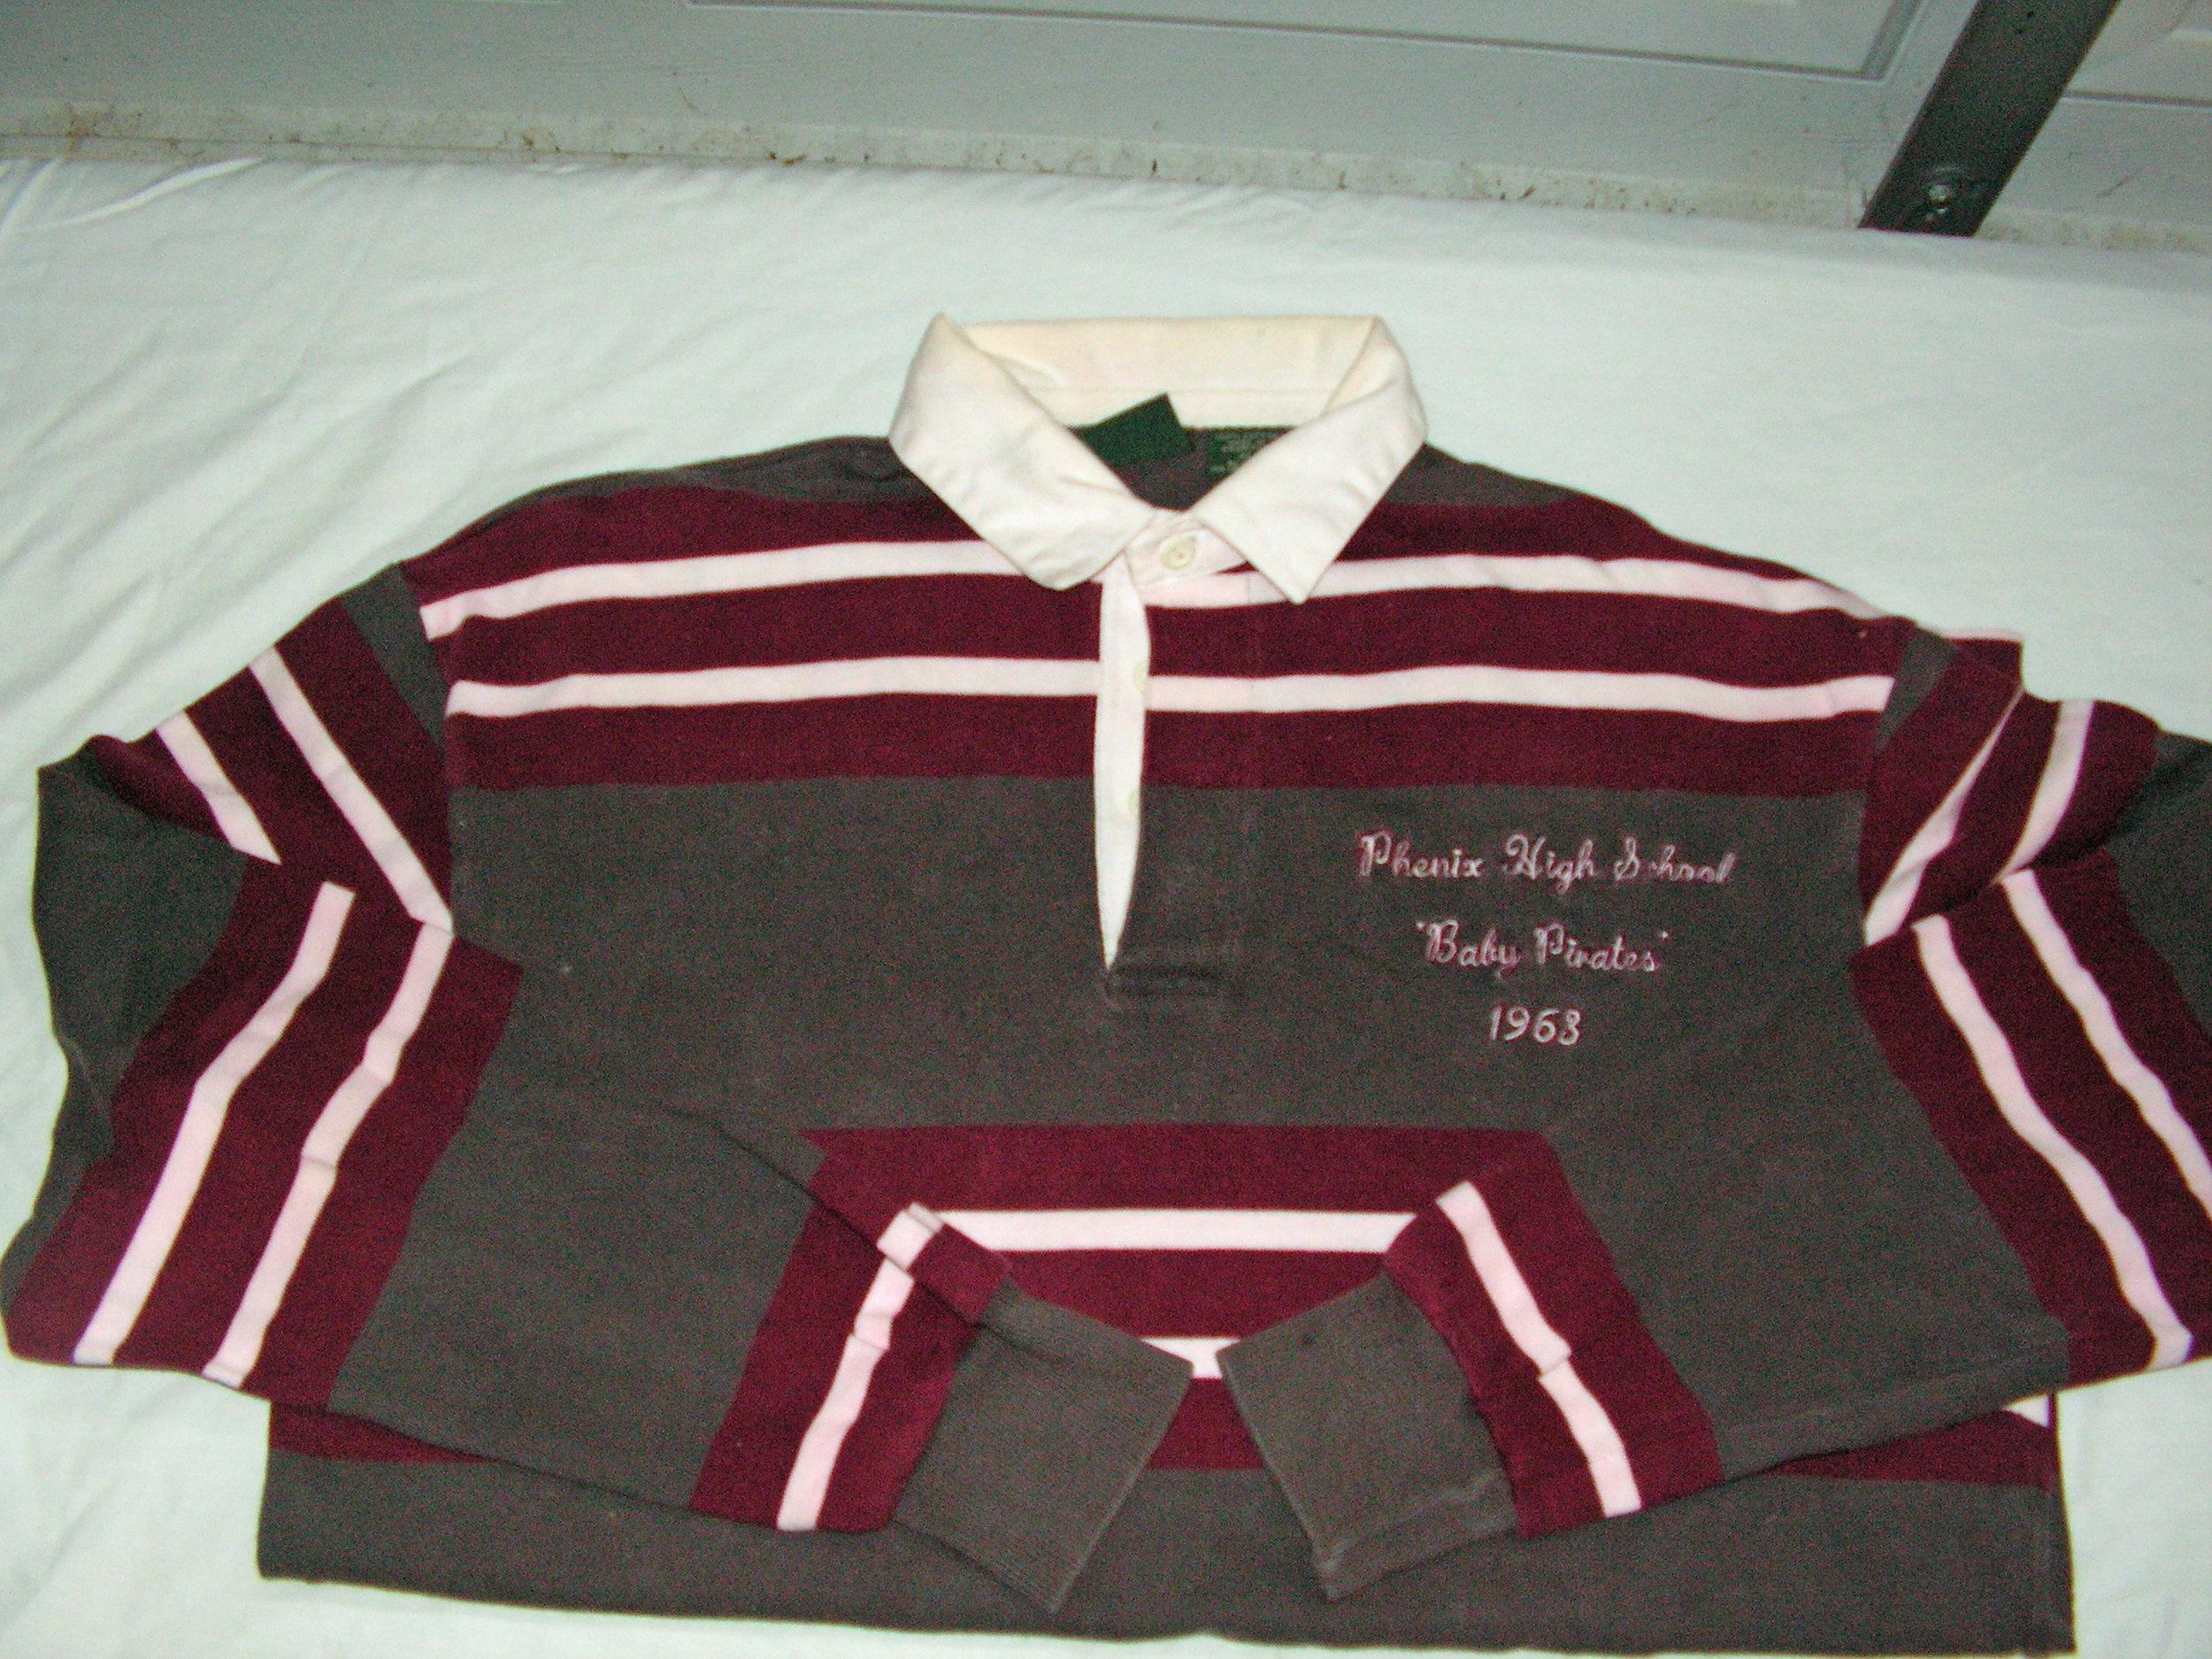 Phenix Shirt, 1963